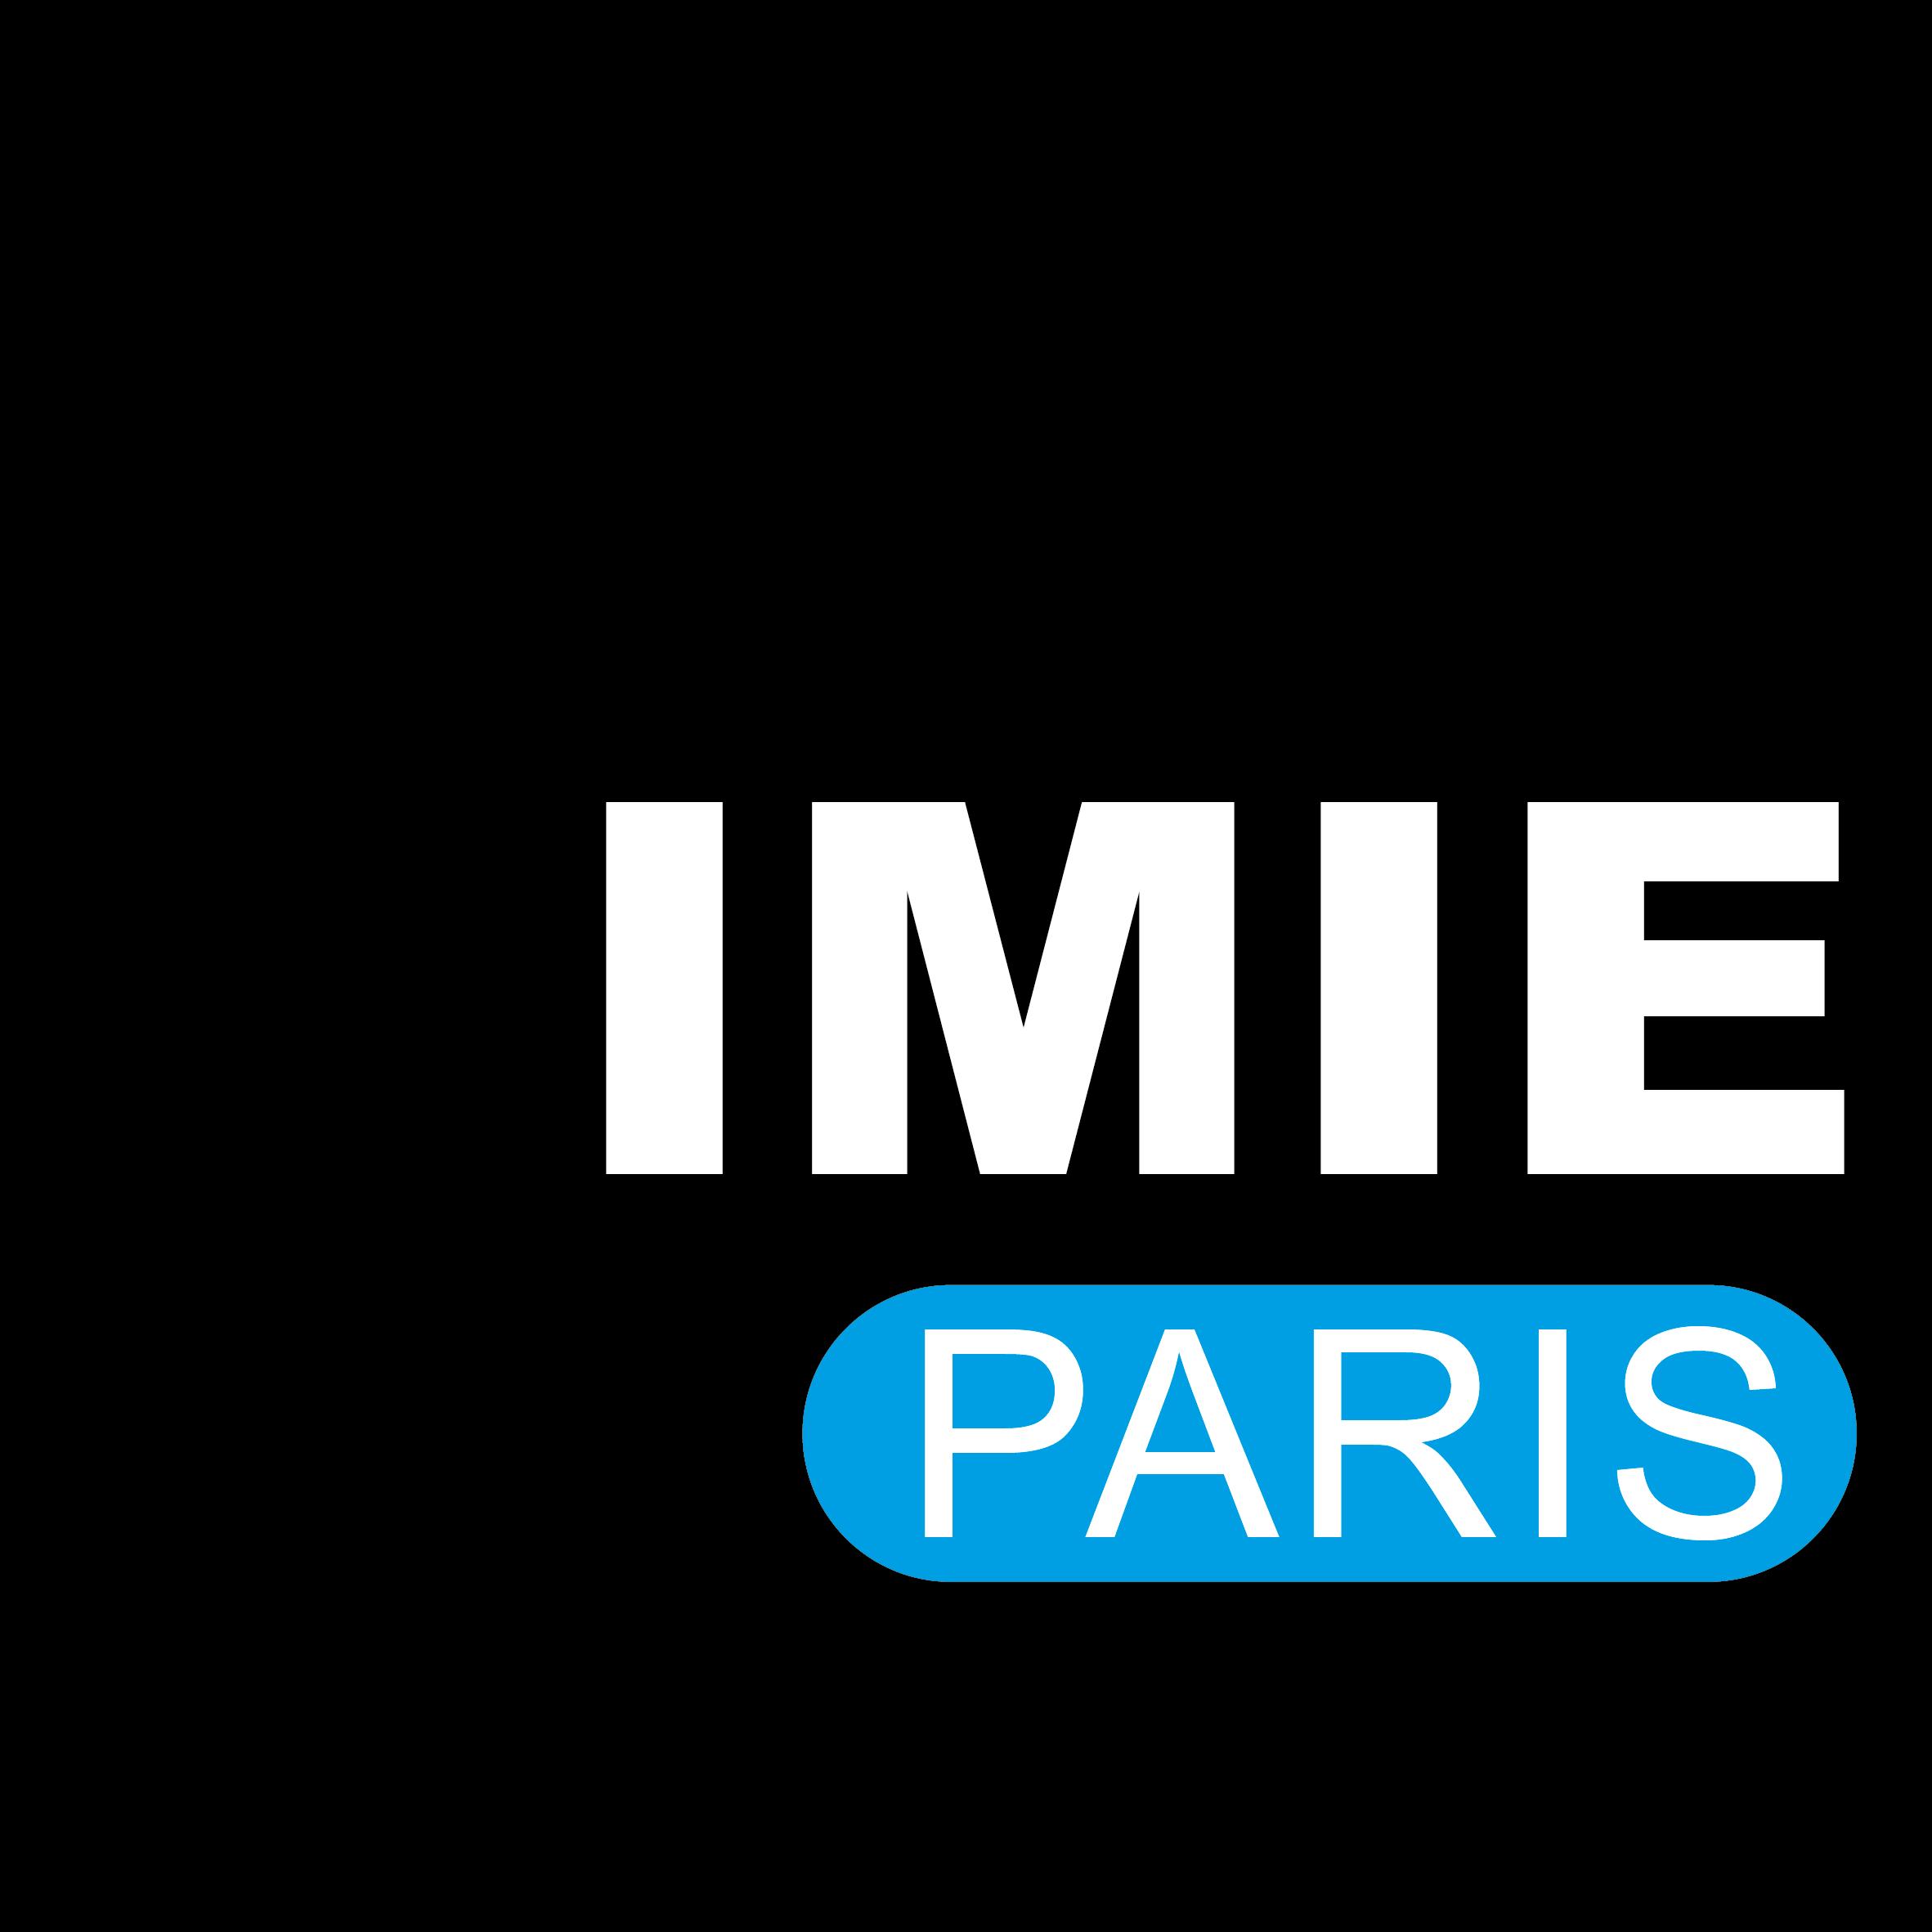 IMIE PARIS